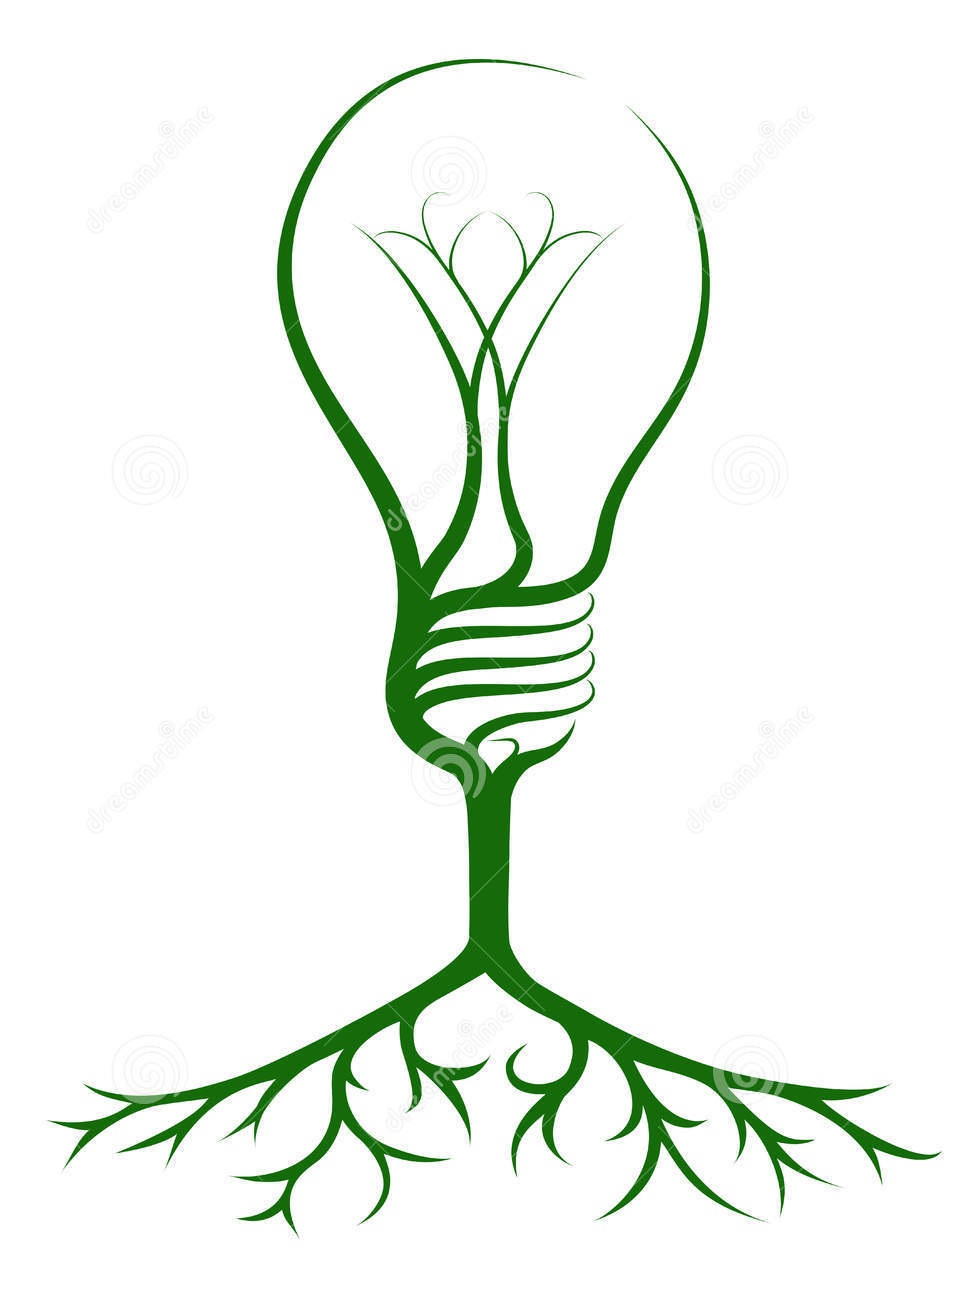 idea-light-bulb-tree-concept-growing-shape-lightbulb-could-be-concept-ideas-inspiration-63249611.jpg